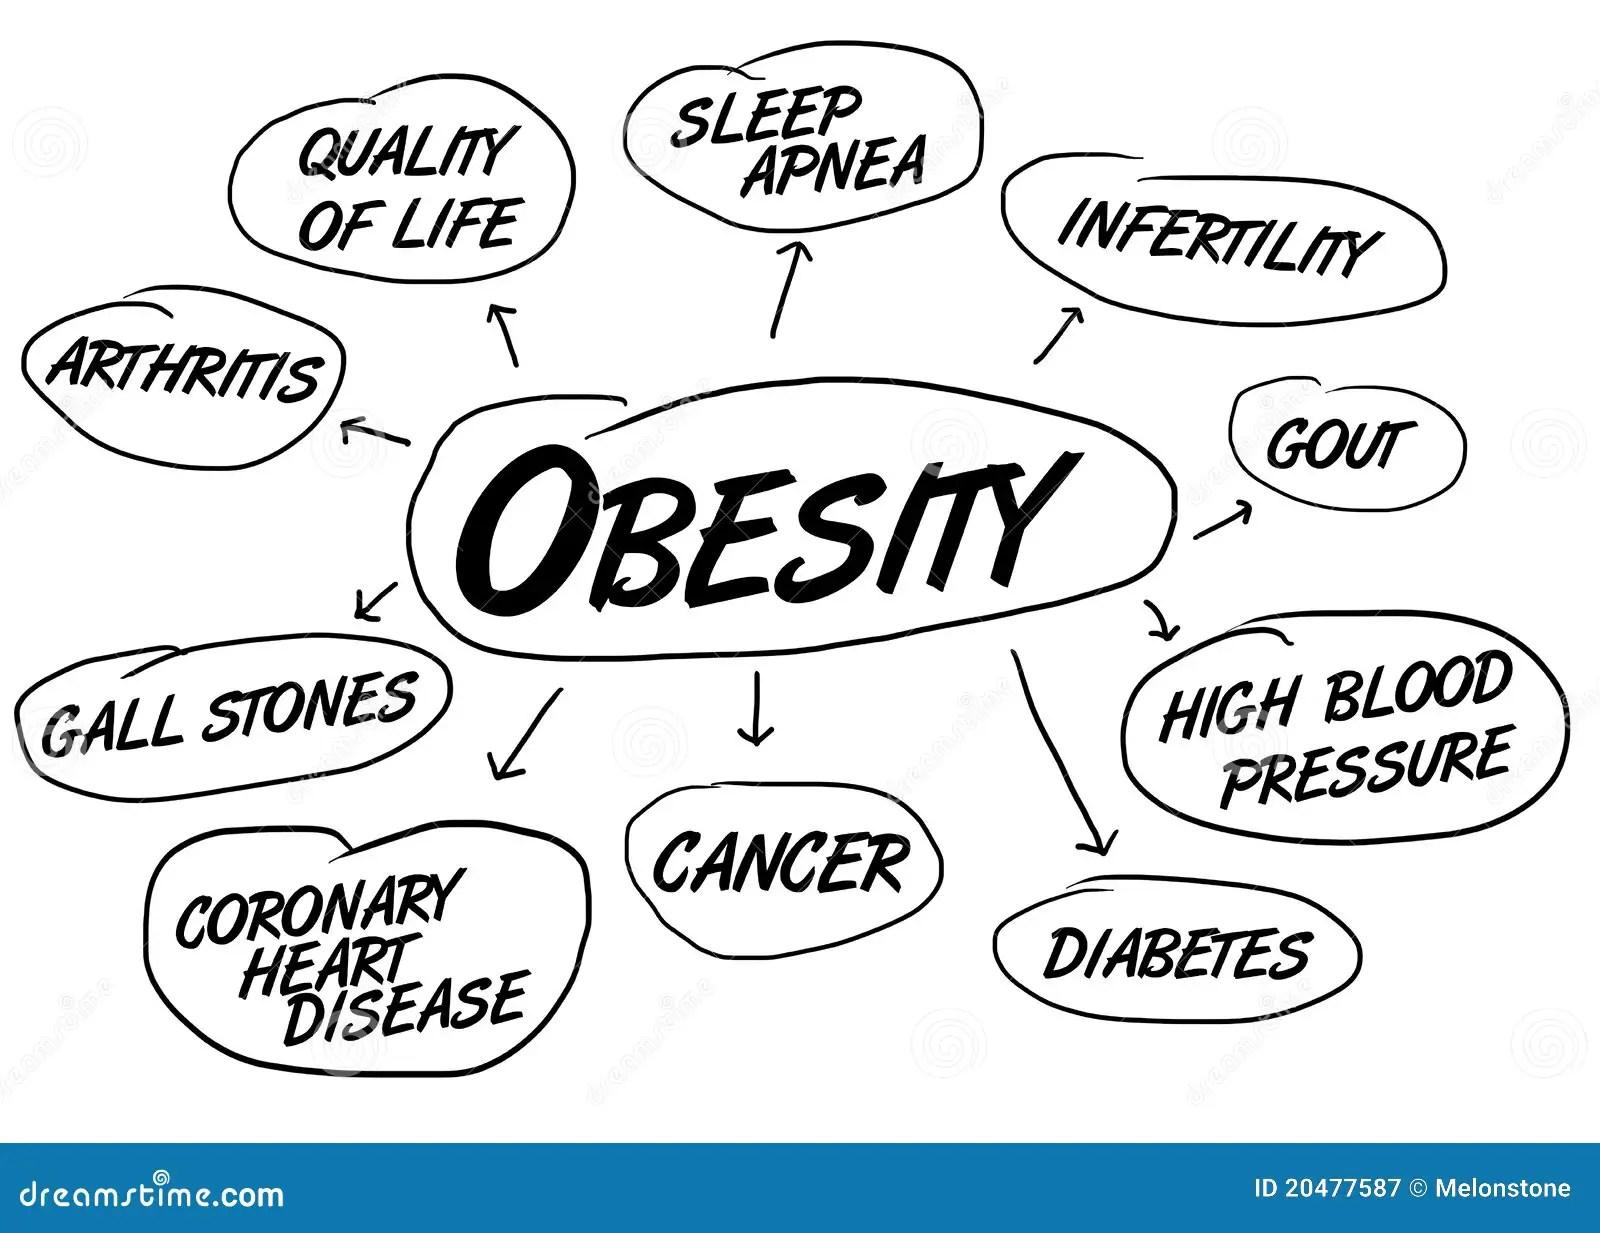 Obesity Health Conditions Stock Illustration Illustration